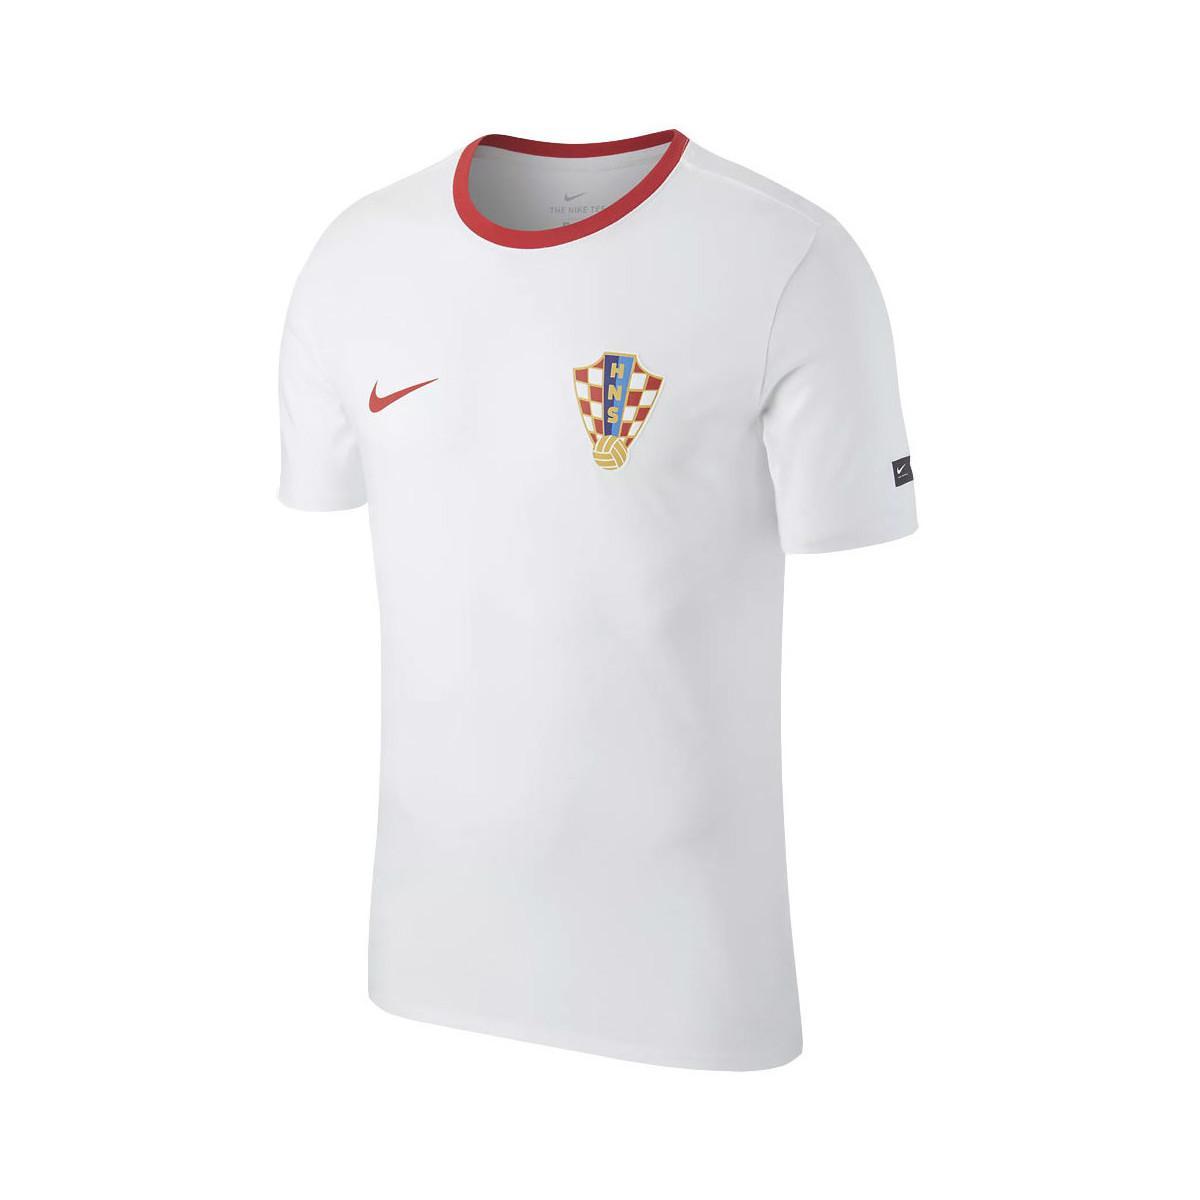 00ee49f9 Nike 2018-2019 Croatia Crest Tee Women's T Shirt In White in White ...